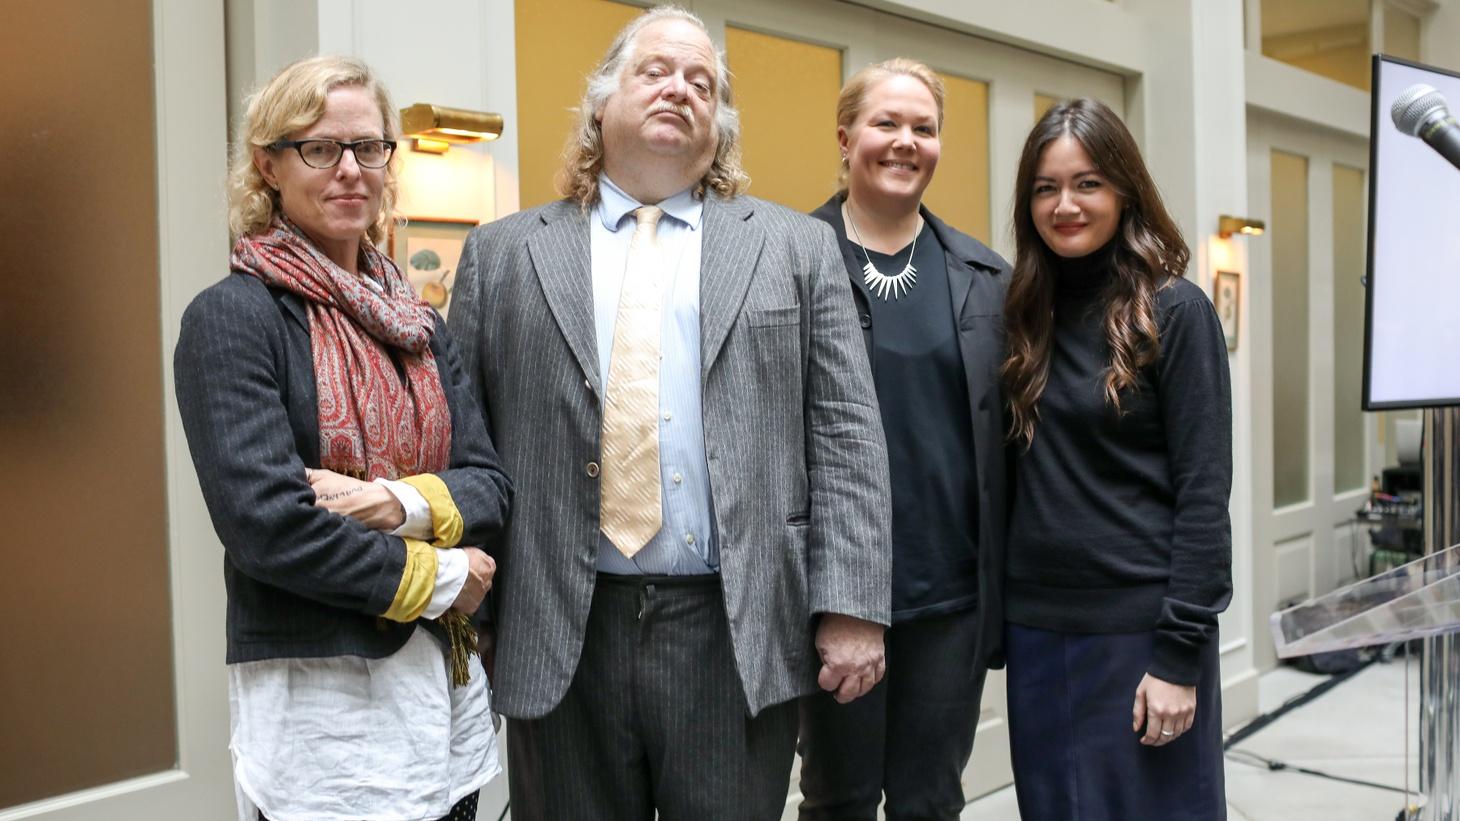 L-R. Amy Scattergood, Jonathan Gold, Noelle Carter and Jenn Harris.